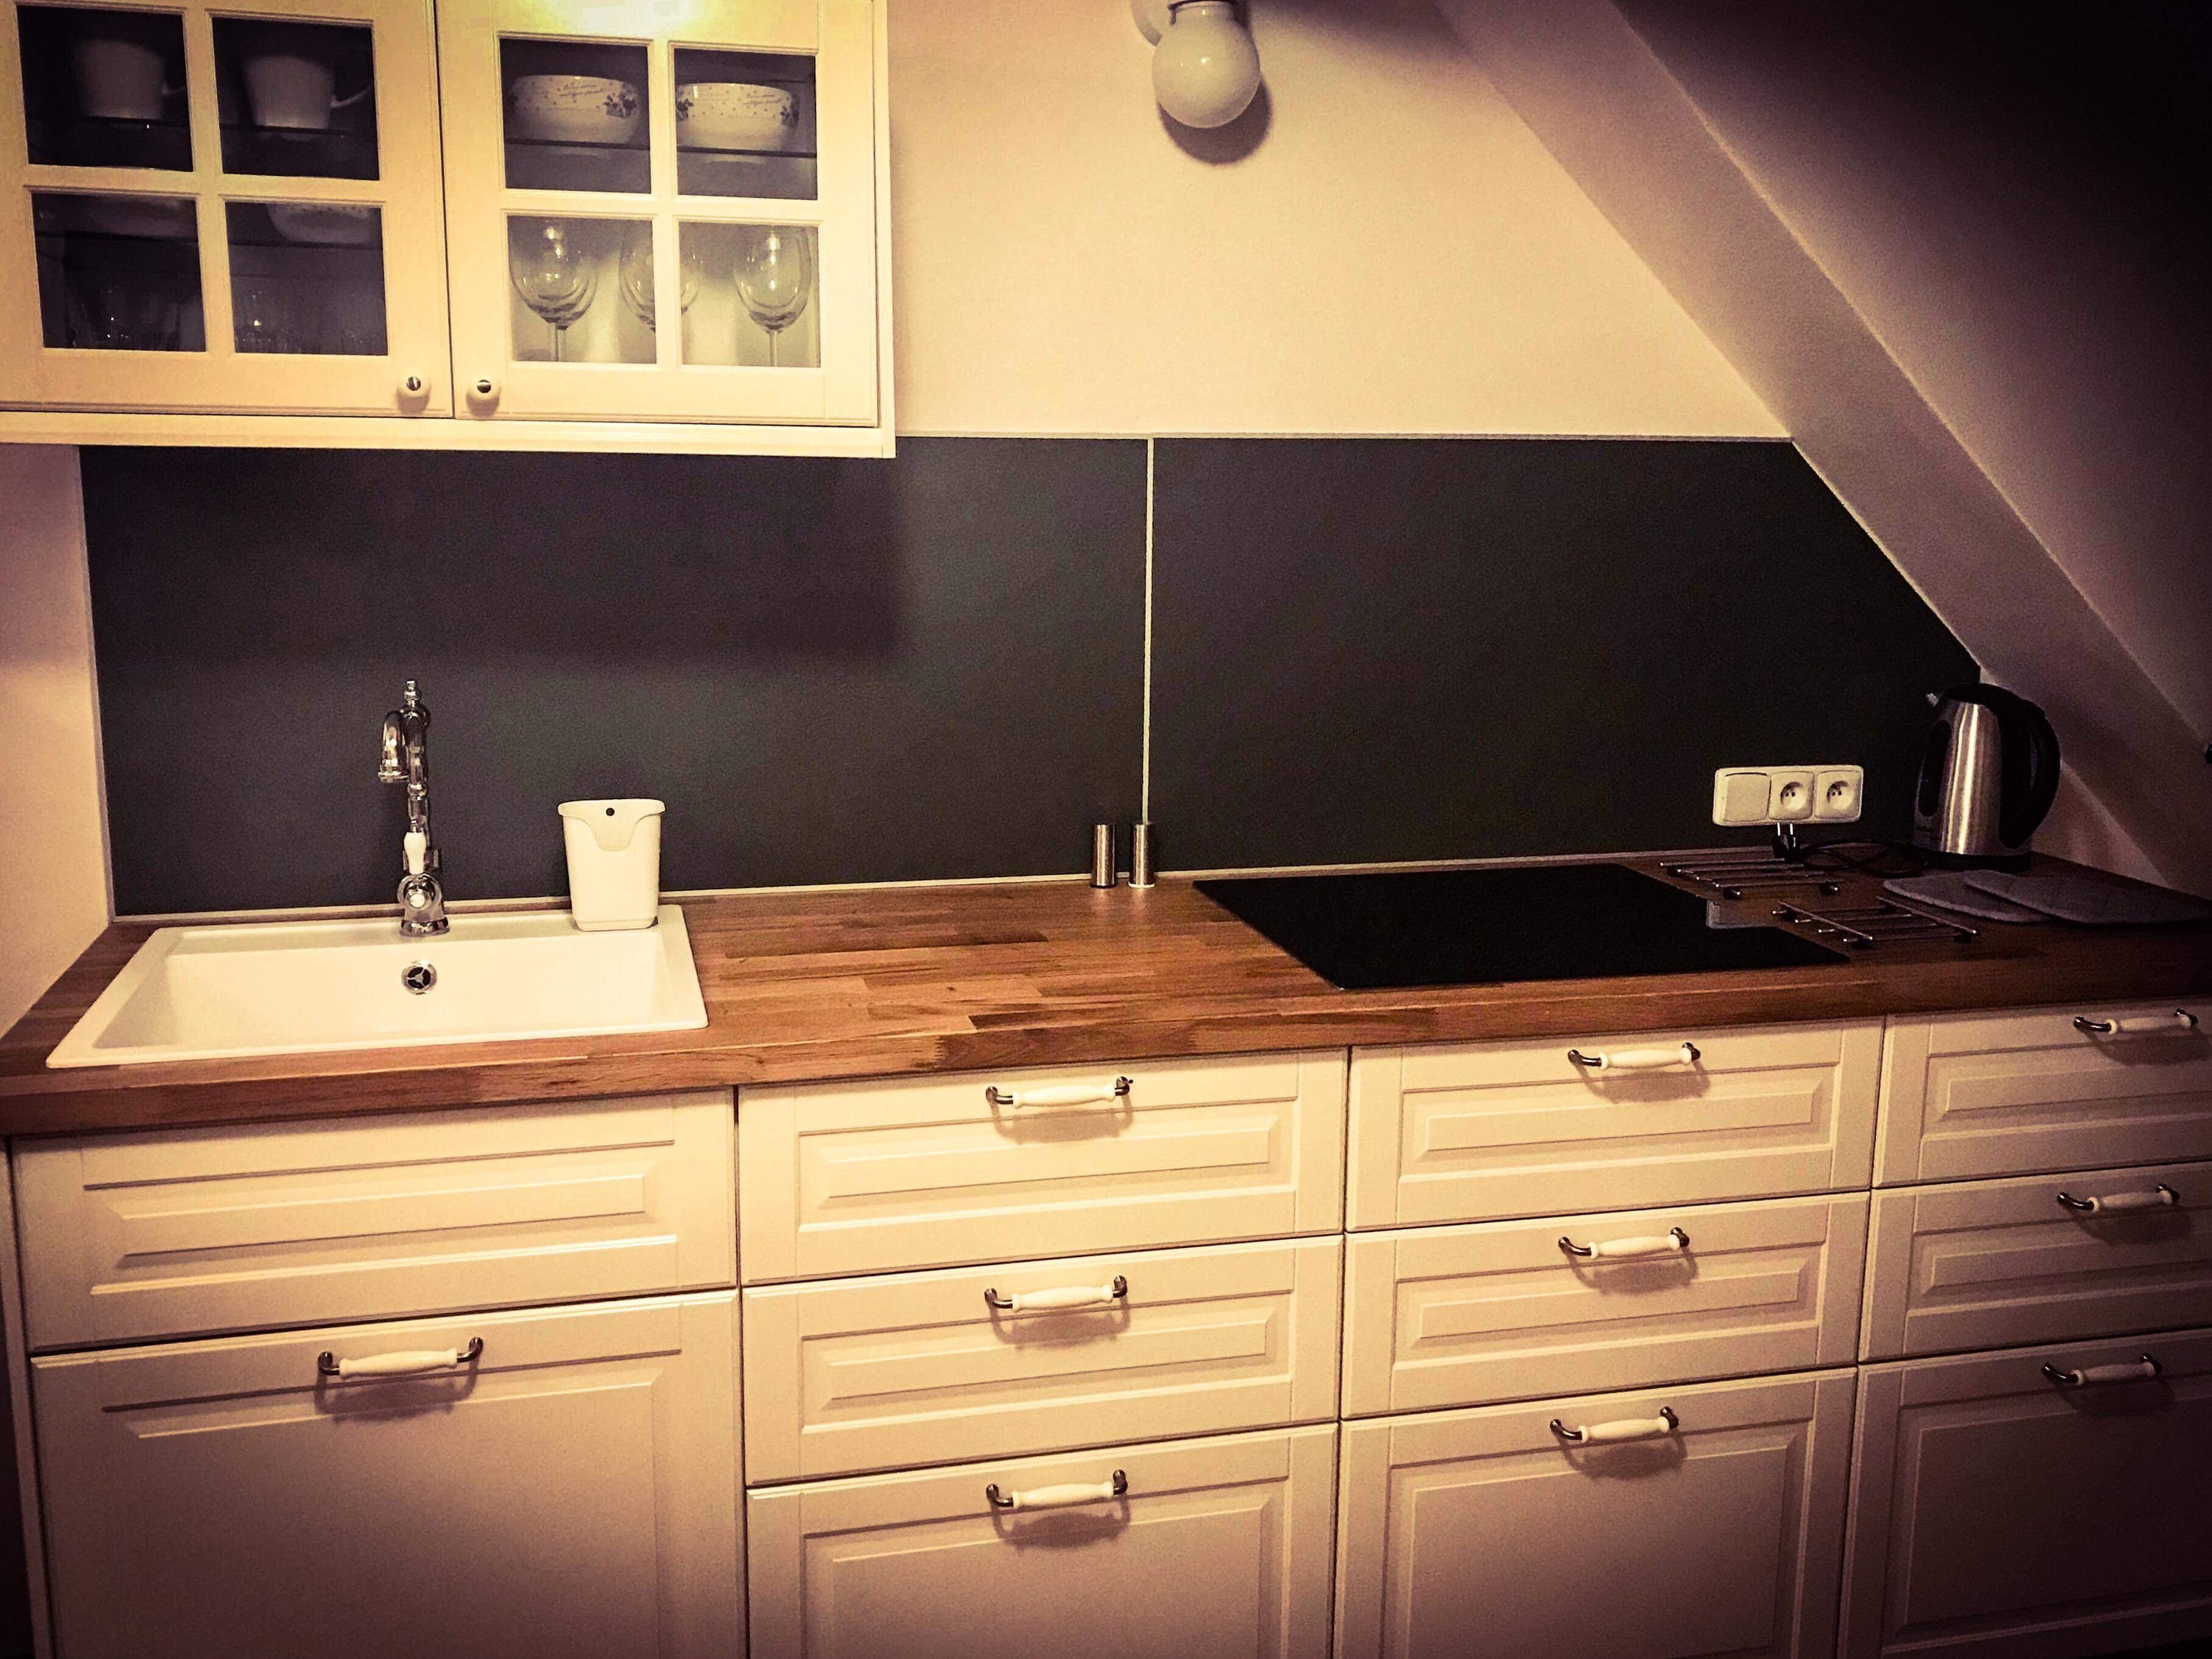 Apartmán 1, kuchyně